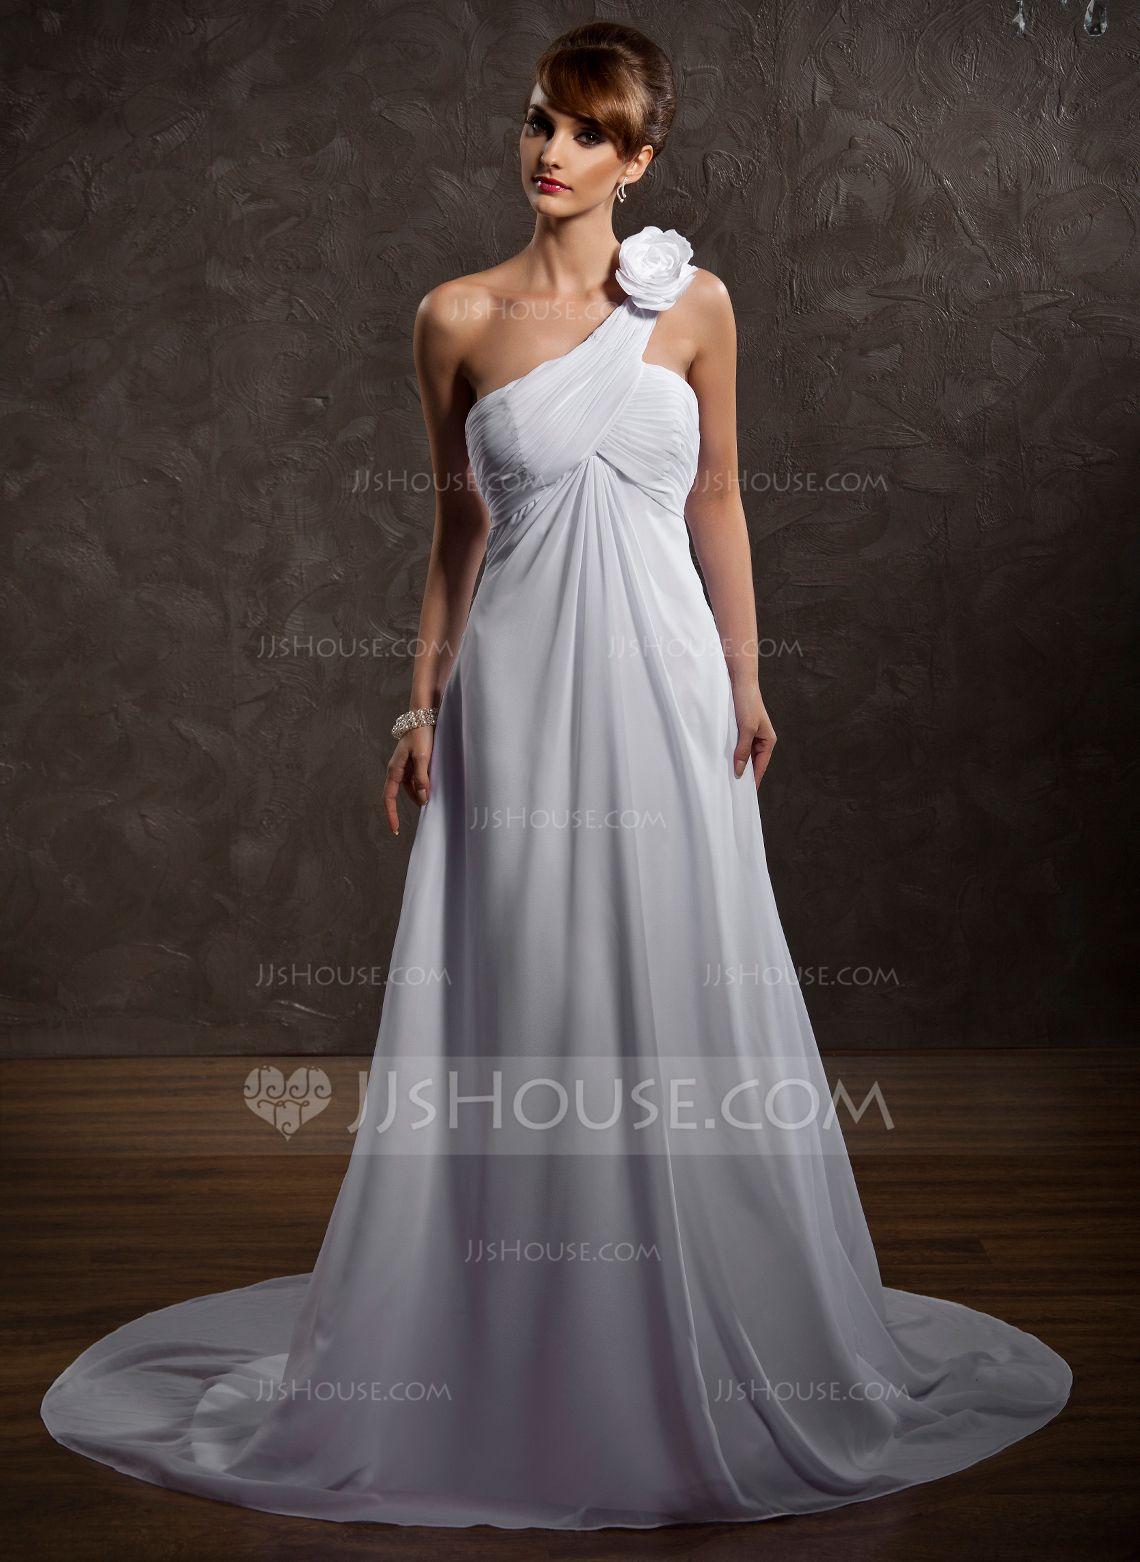 Empire oneshoulder court train chiffon wedding dress with ruffle